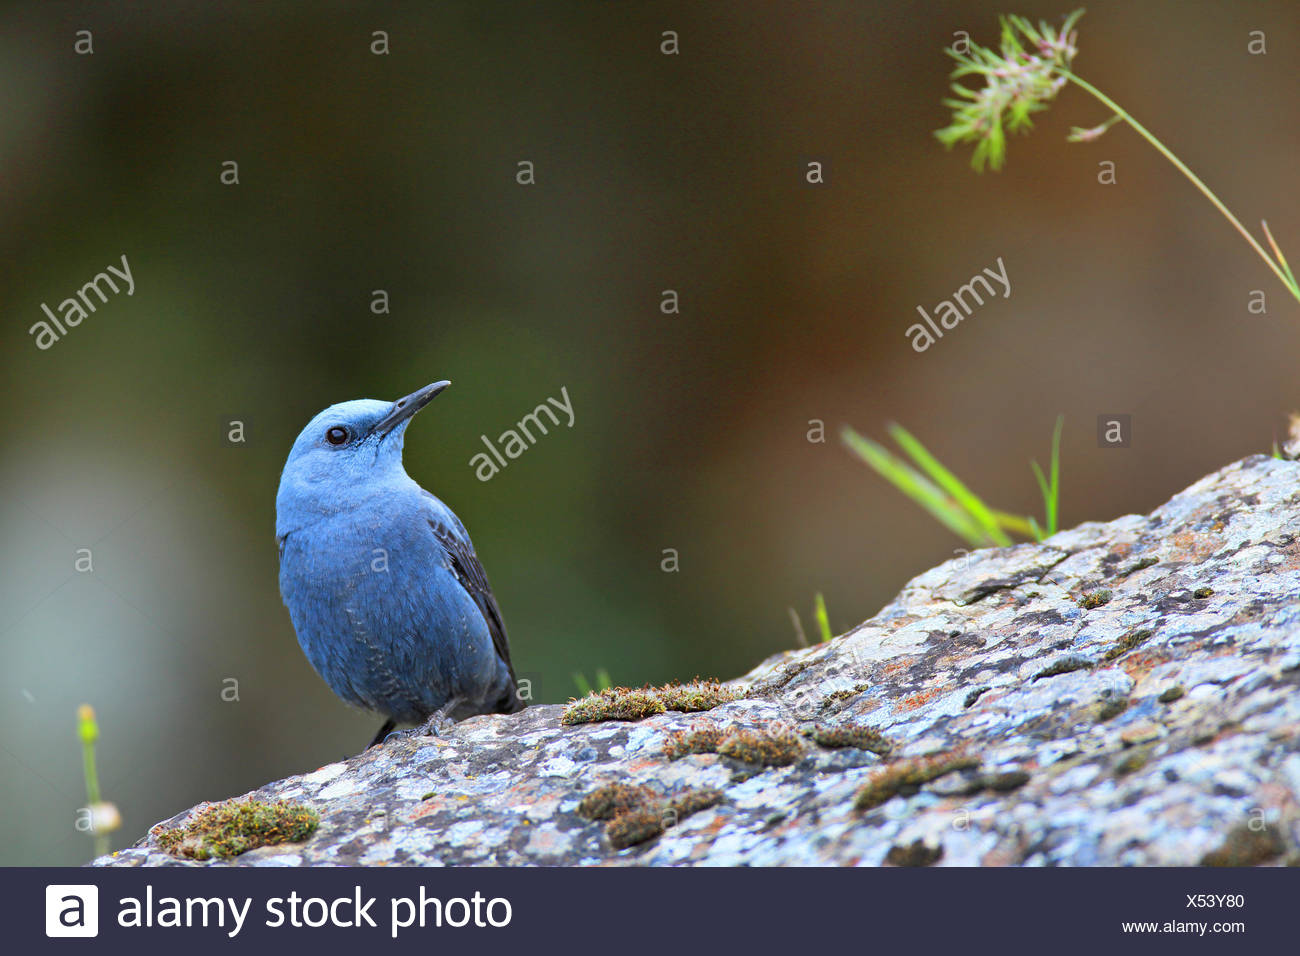 blue rock thrush (Monticola solitarius), male sitting on a rock, Greece, Lesbos - Stock Image